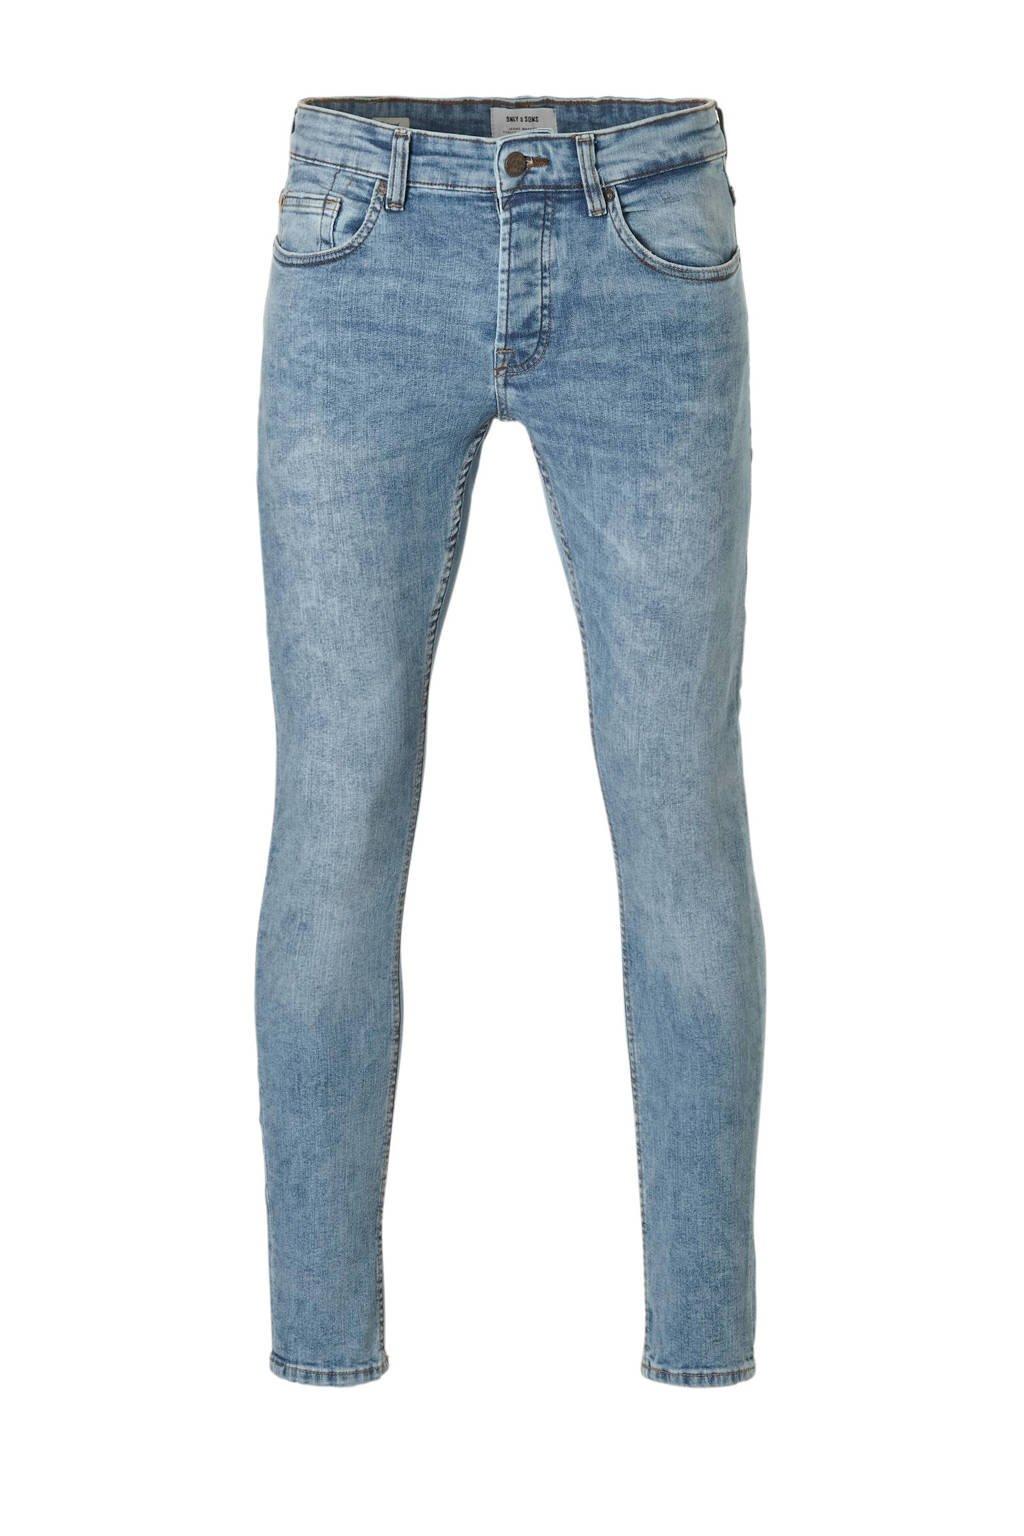 Only & Sons slim fit jeans, Light denim